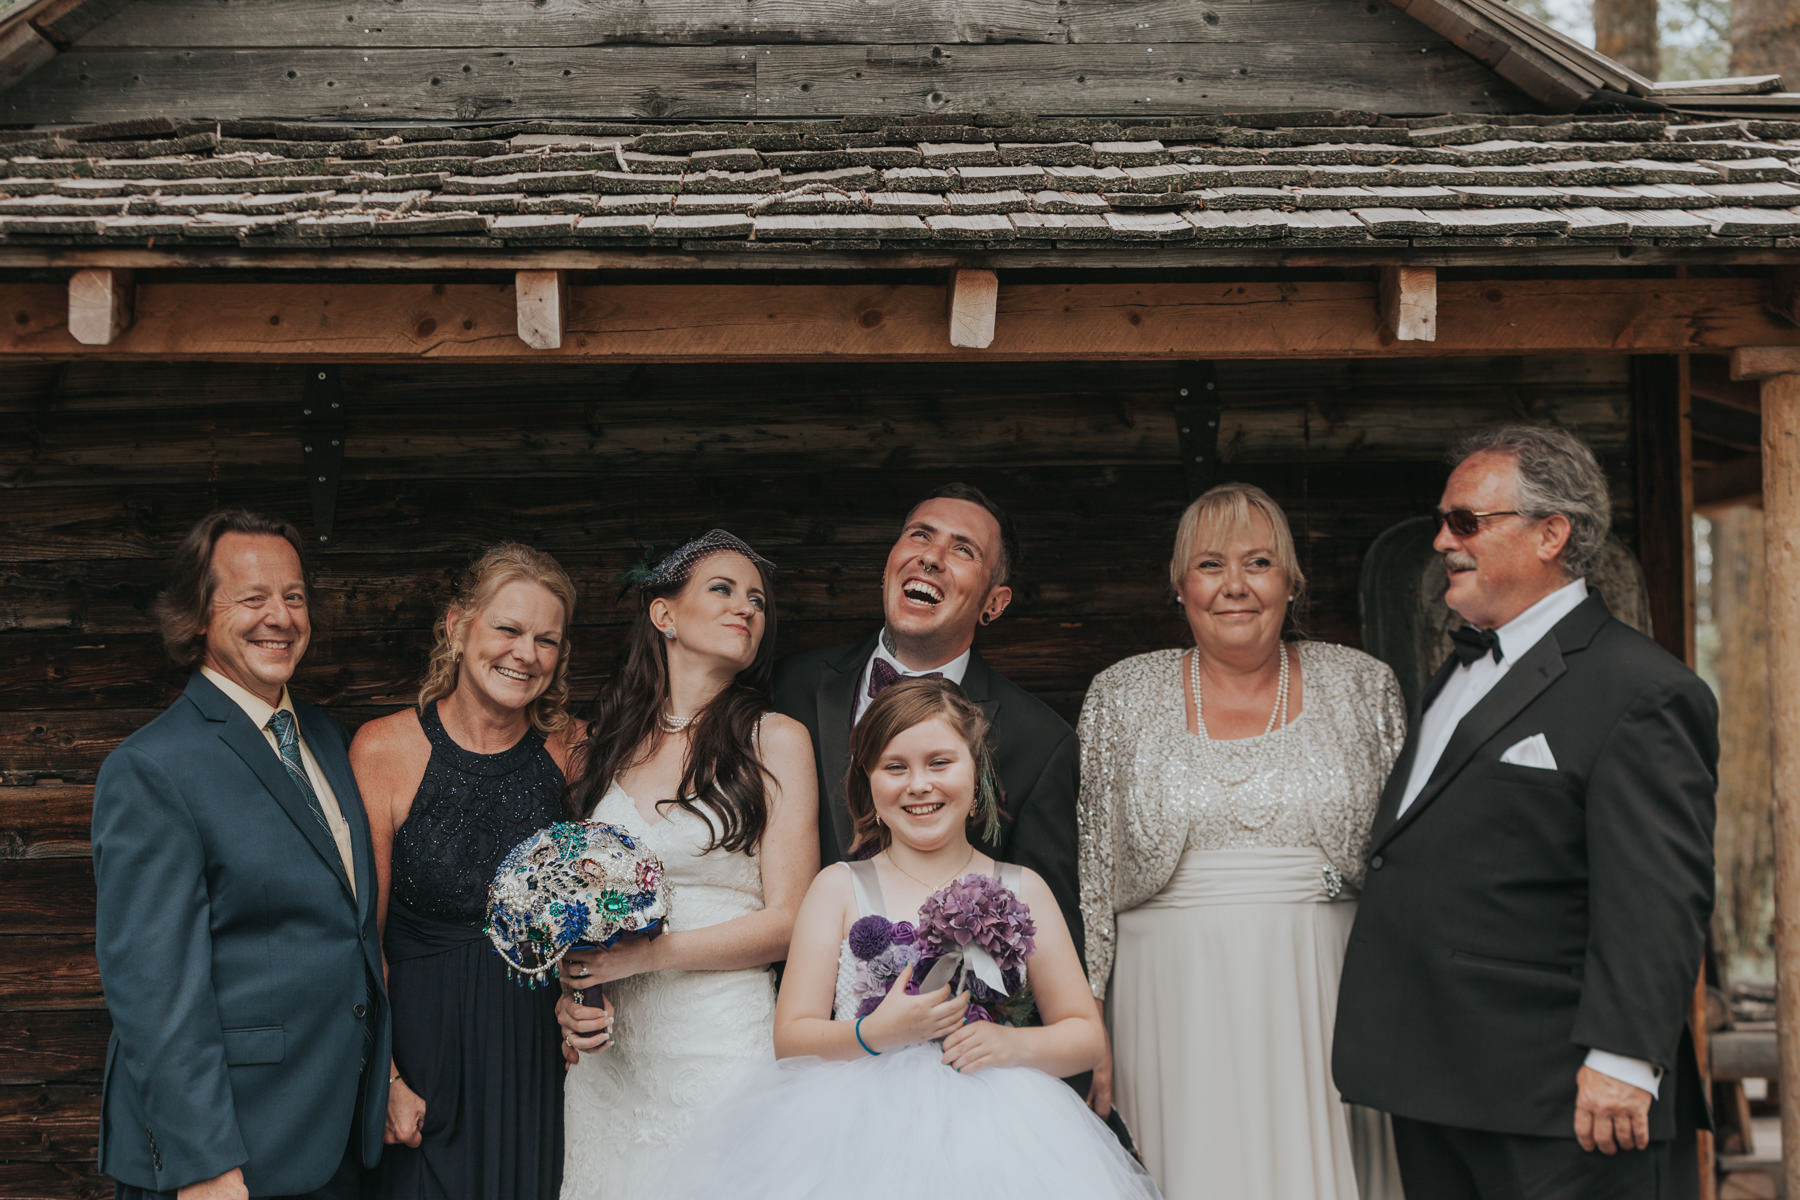 Vancouver Wedding Photographer Pam (47).jpg